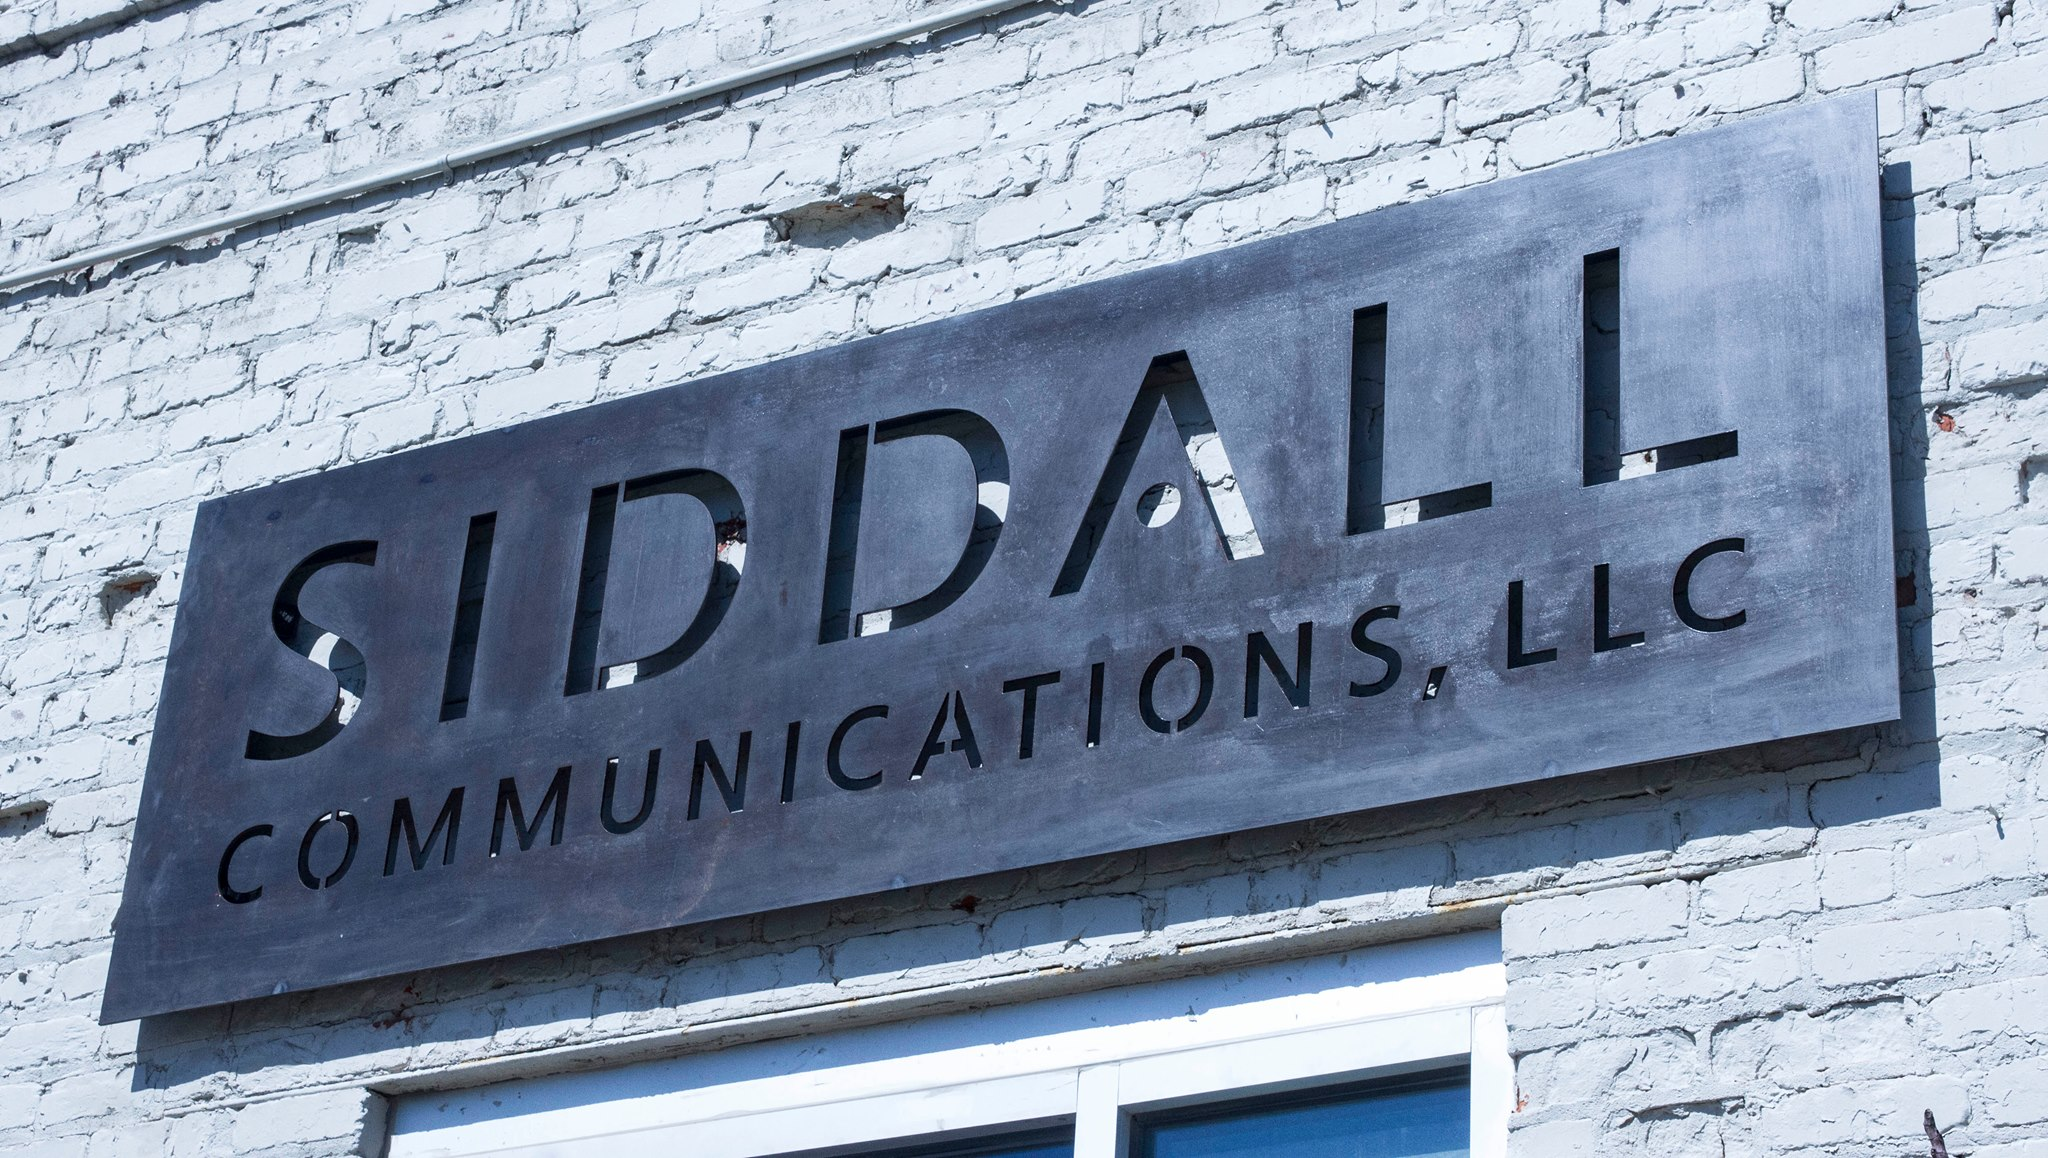 SIDDALL METAL SIGN